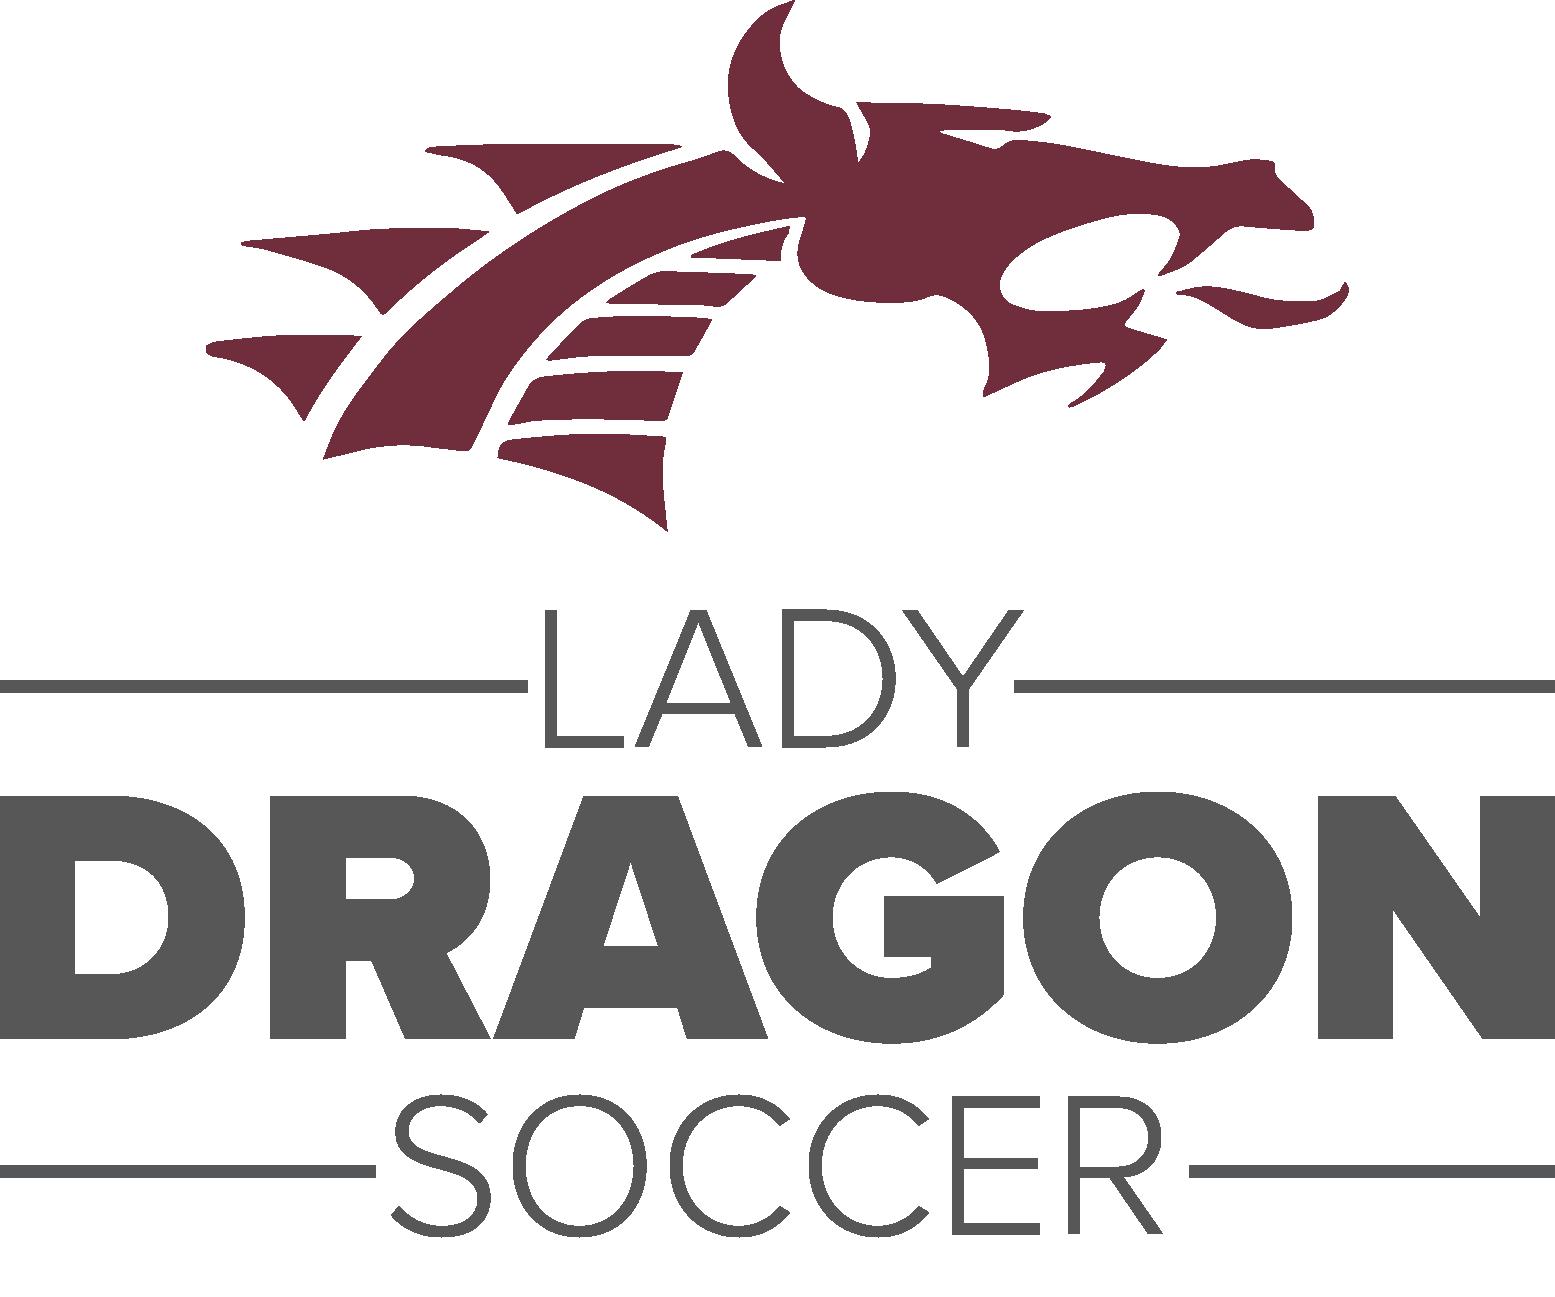 Alternate Lady Dragons Logo - Teamapp.png